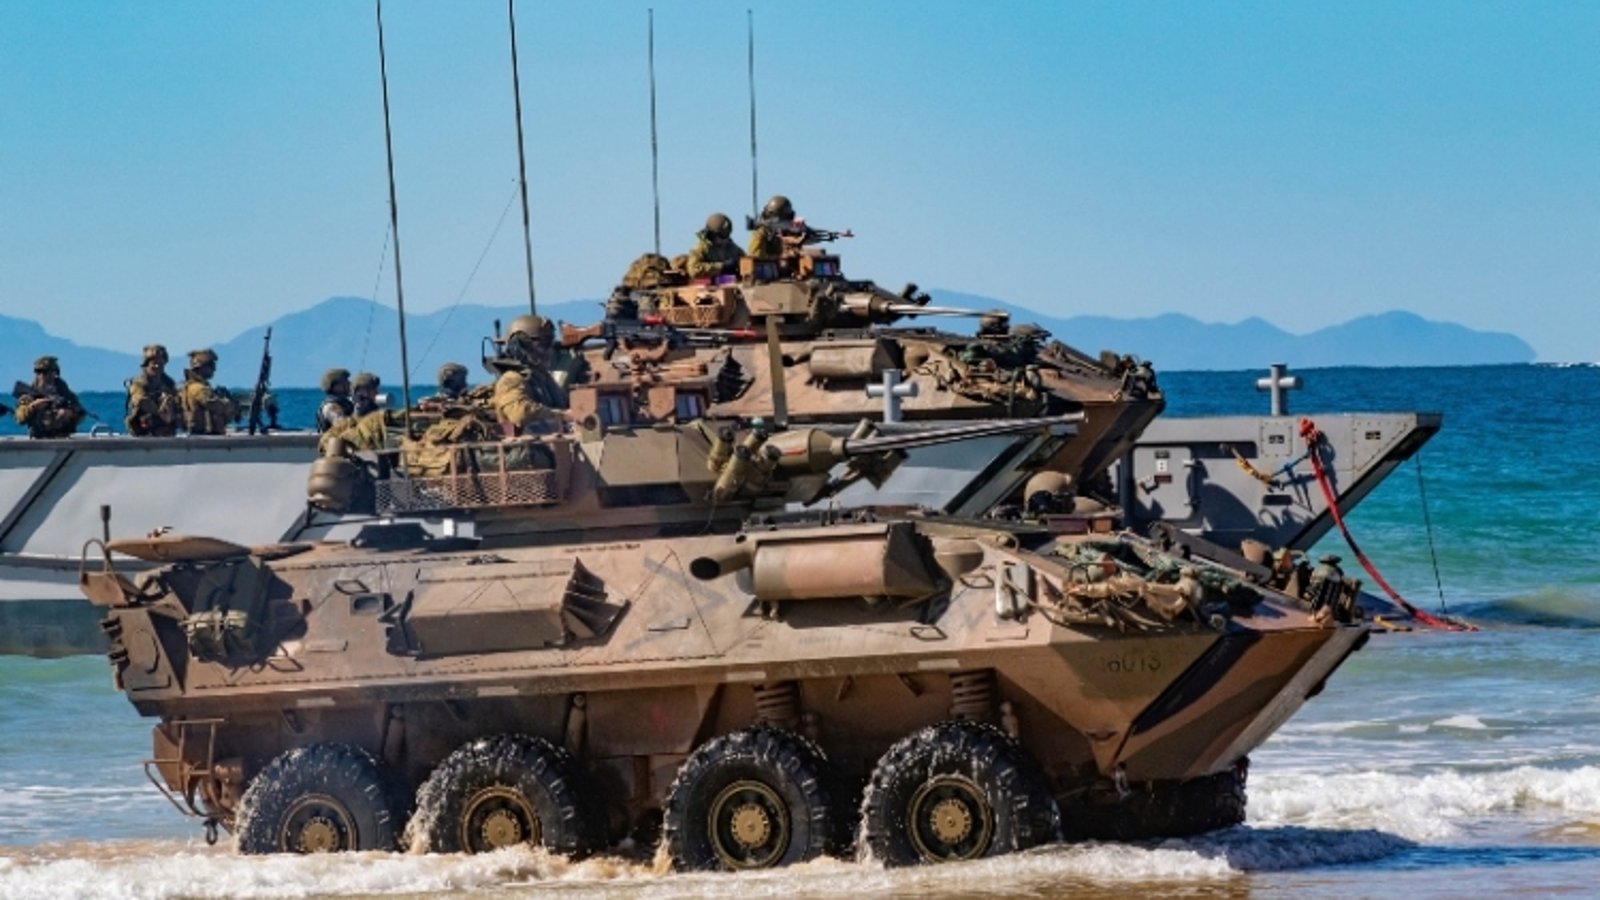 Australia chuẩn bị tập trận quân sự quy mô lớn Talisman Sabre 2021